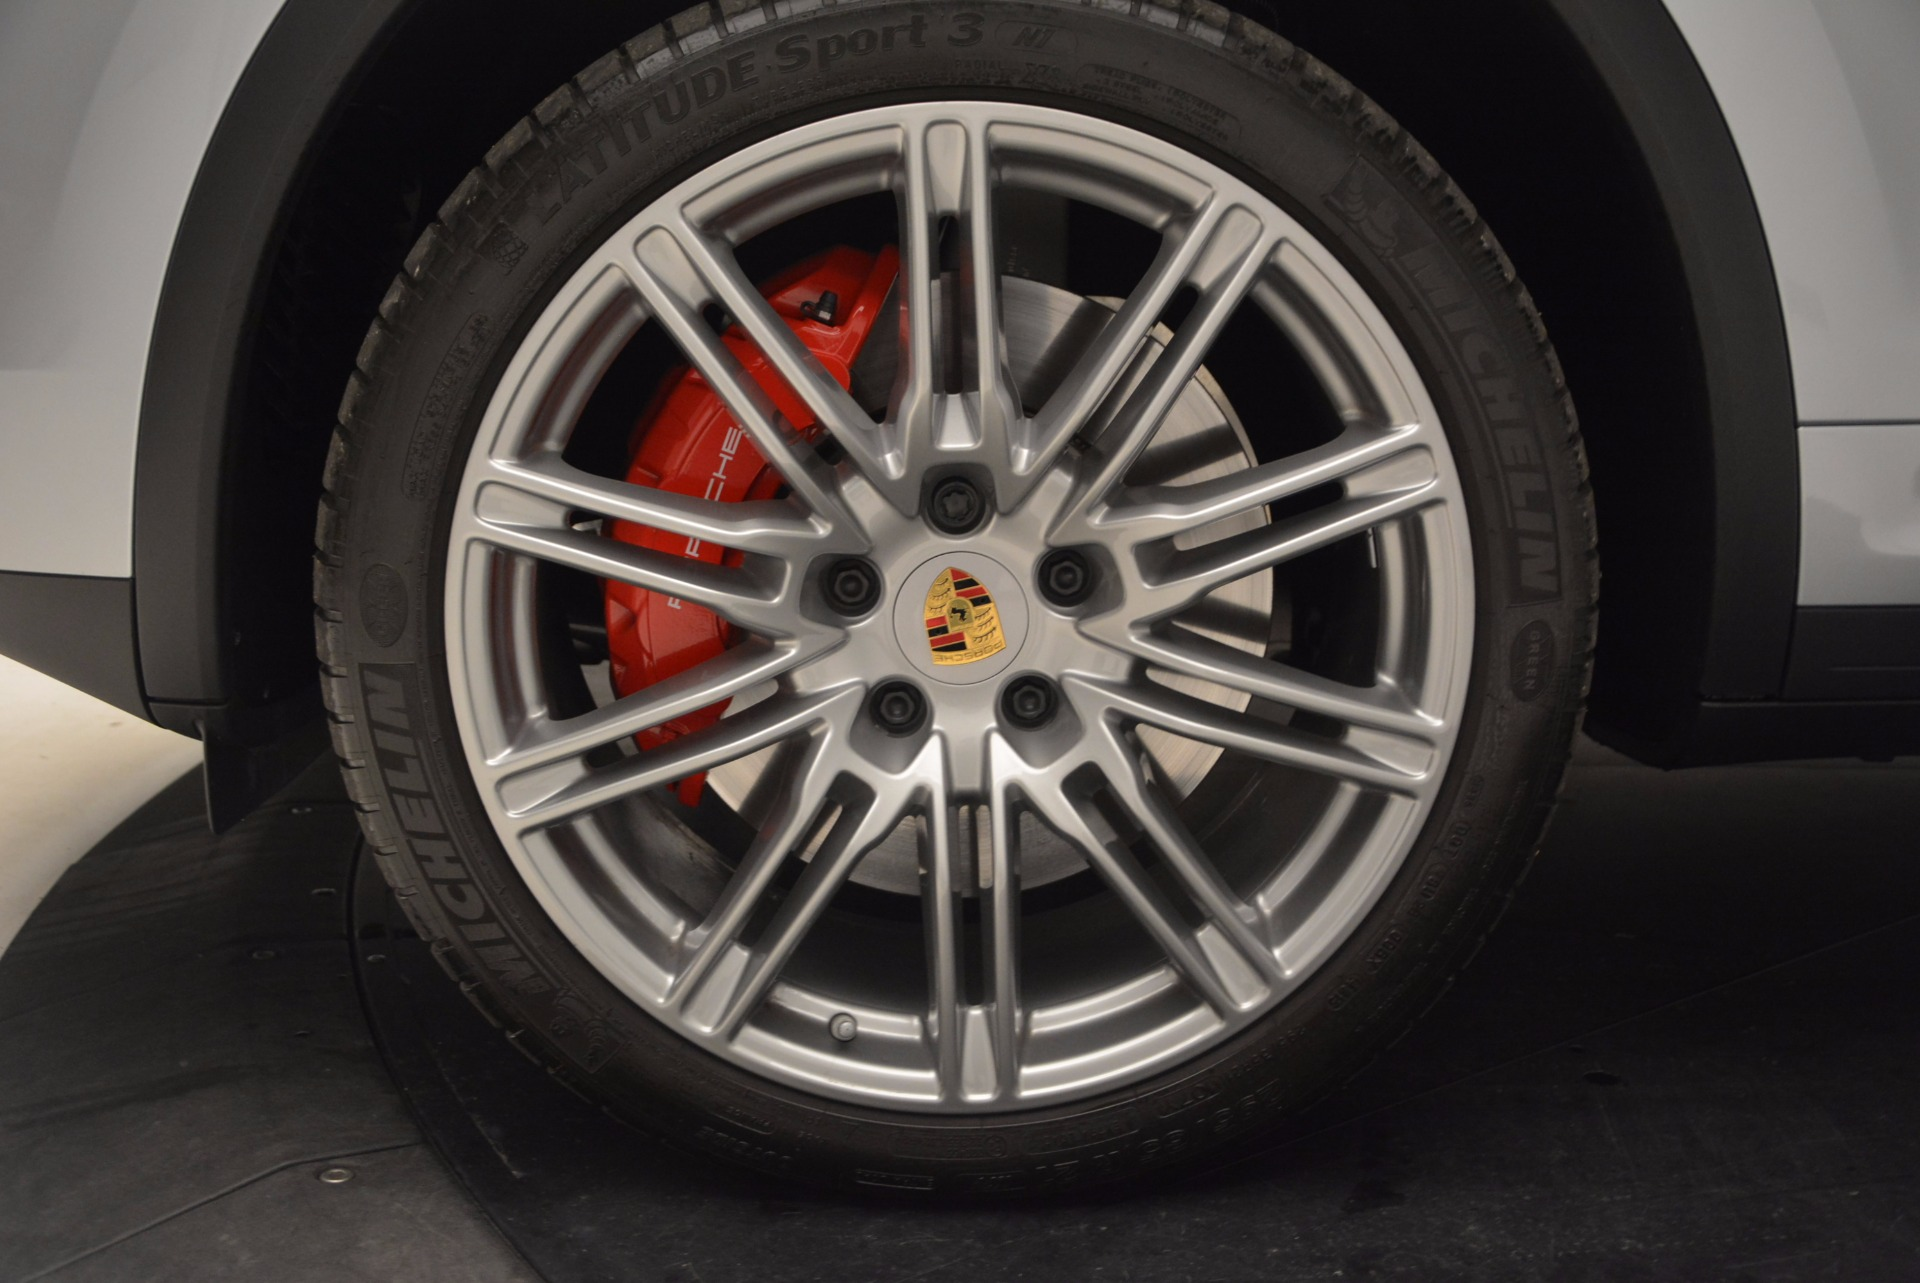 Used 2016 Porsche Cayenne Turbo For Sale In Greenwich, CT. Alfa Romeo of Greenwich, 7165 1000_p16